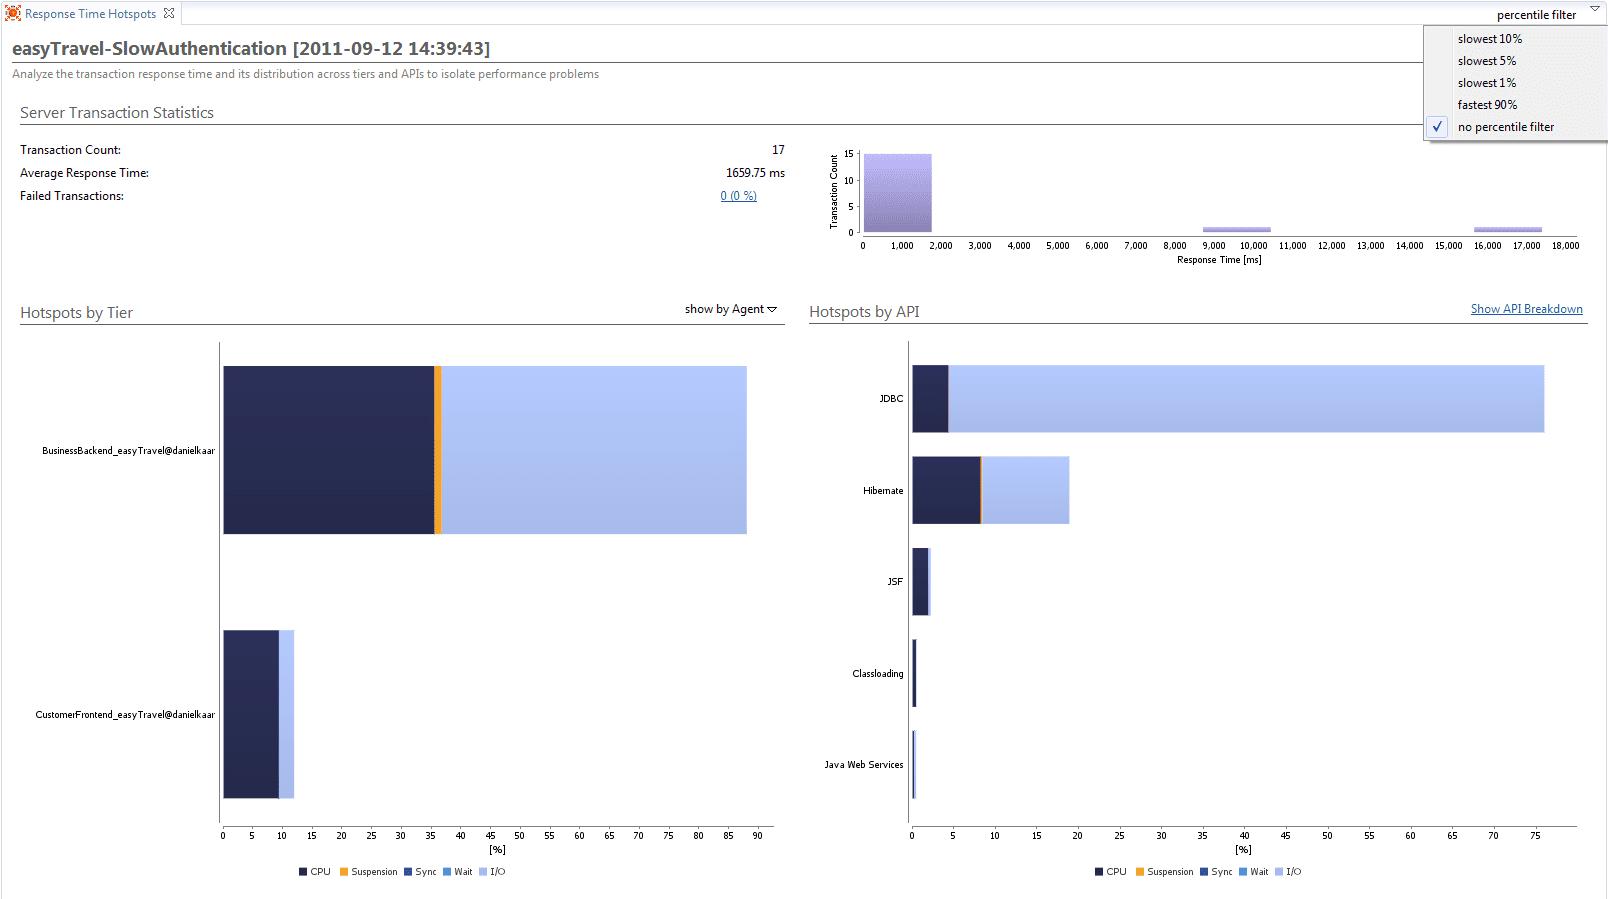 Response Time Hotspots